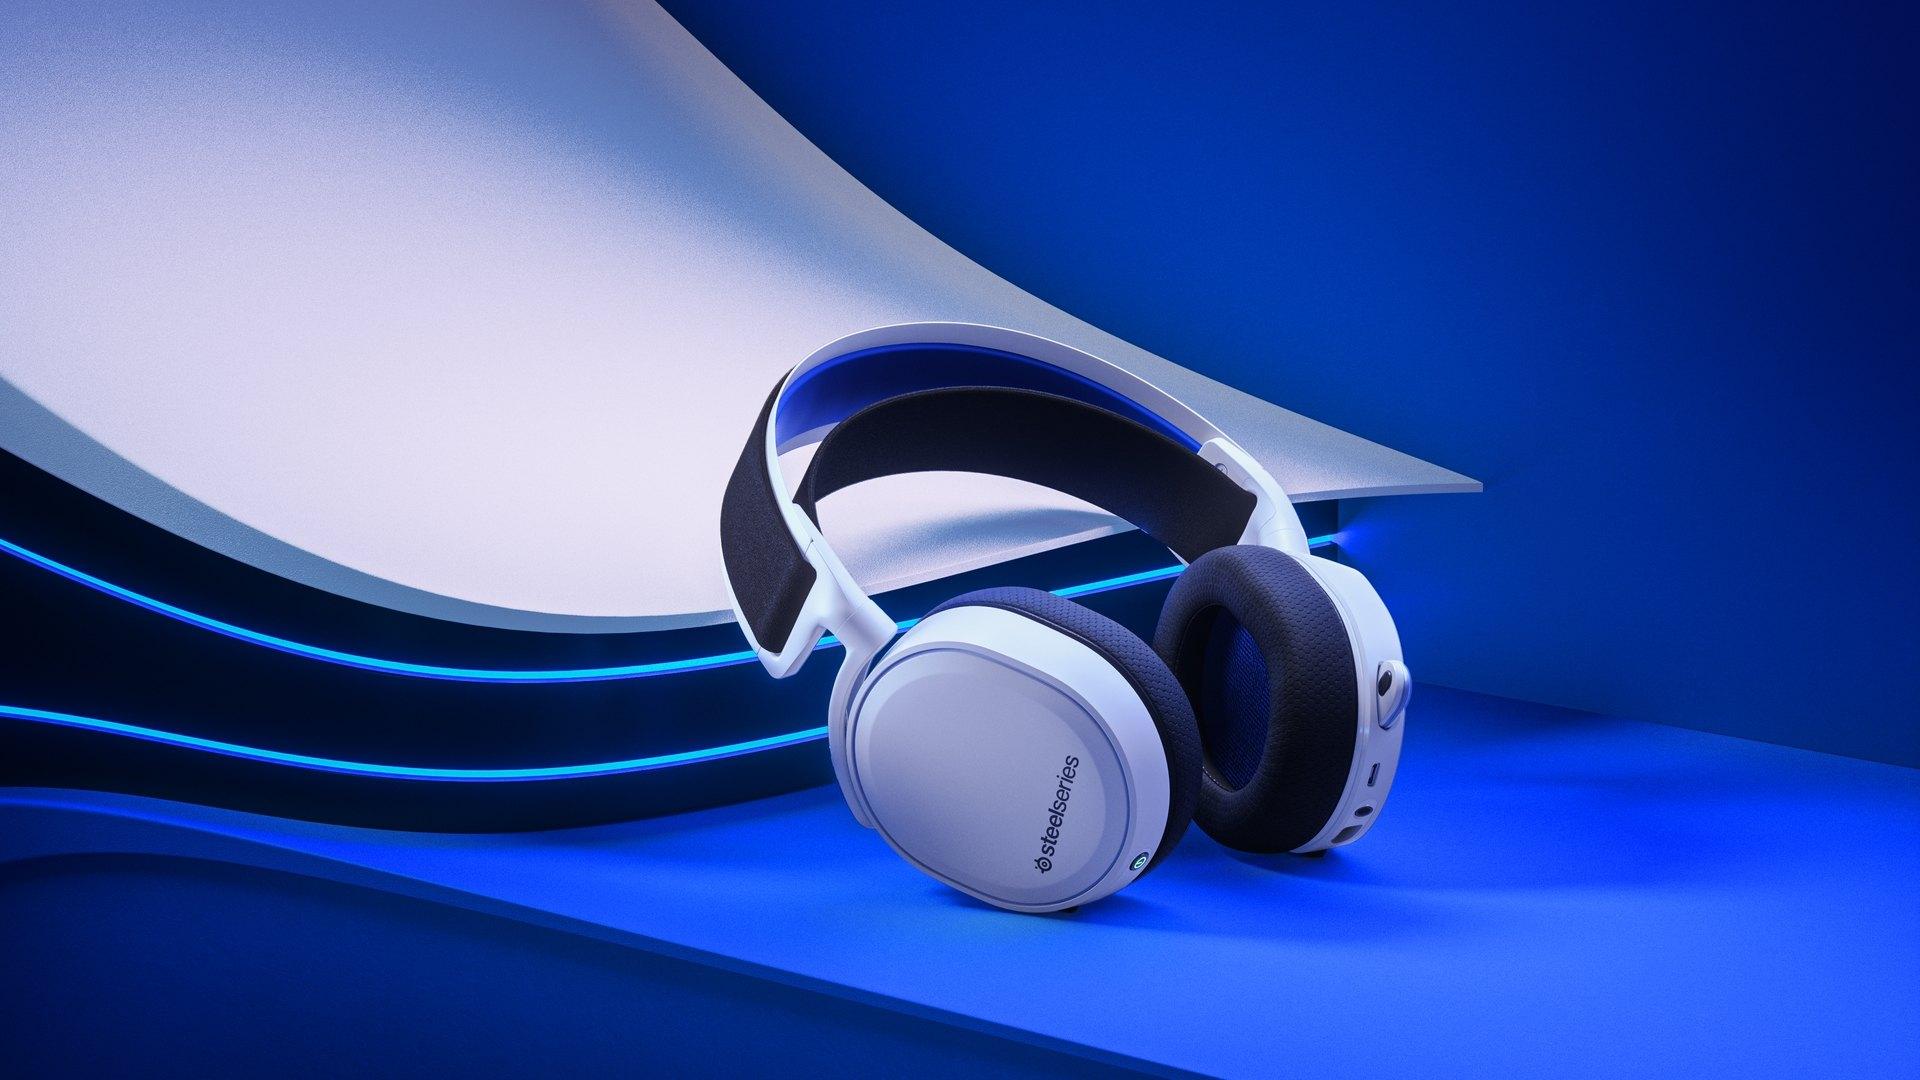 Giới thiệu Tai nghe Steelseries Arctis 7P White WL HS-00021 - 61467